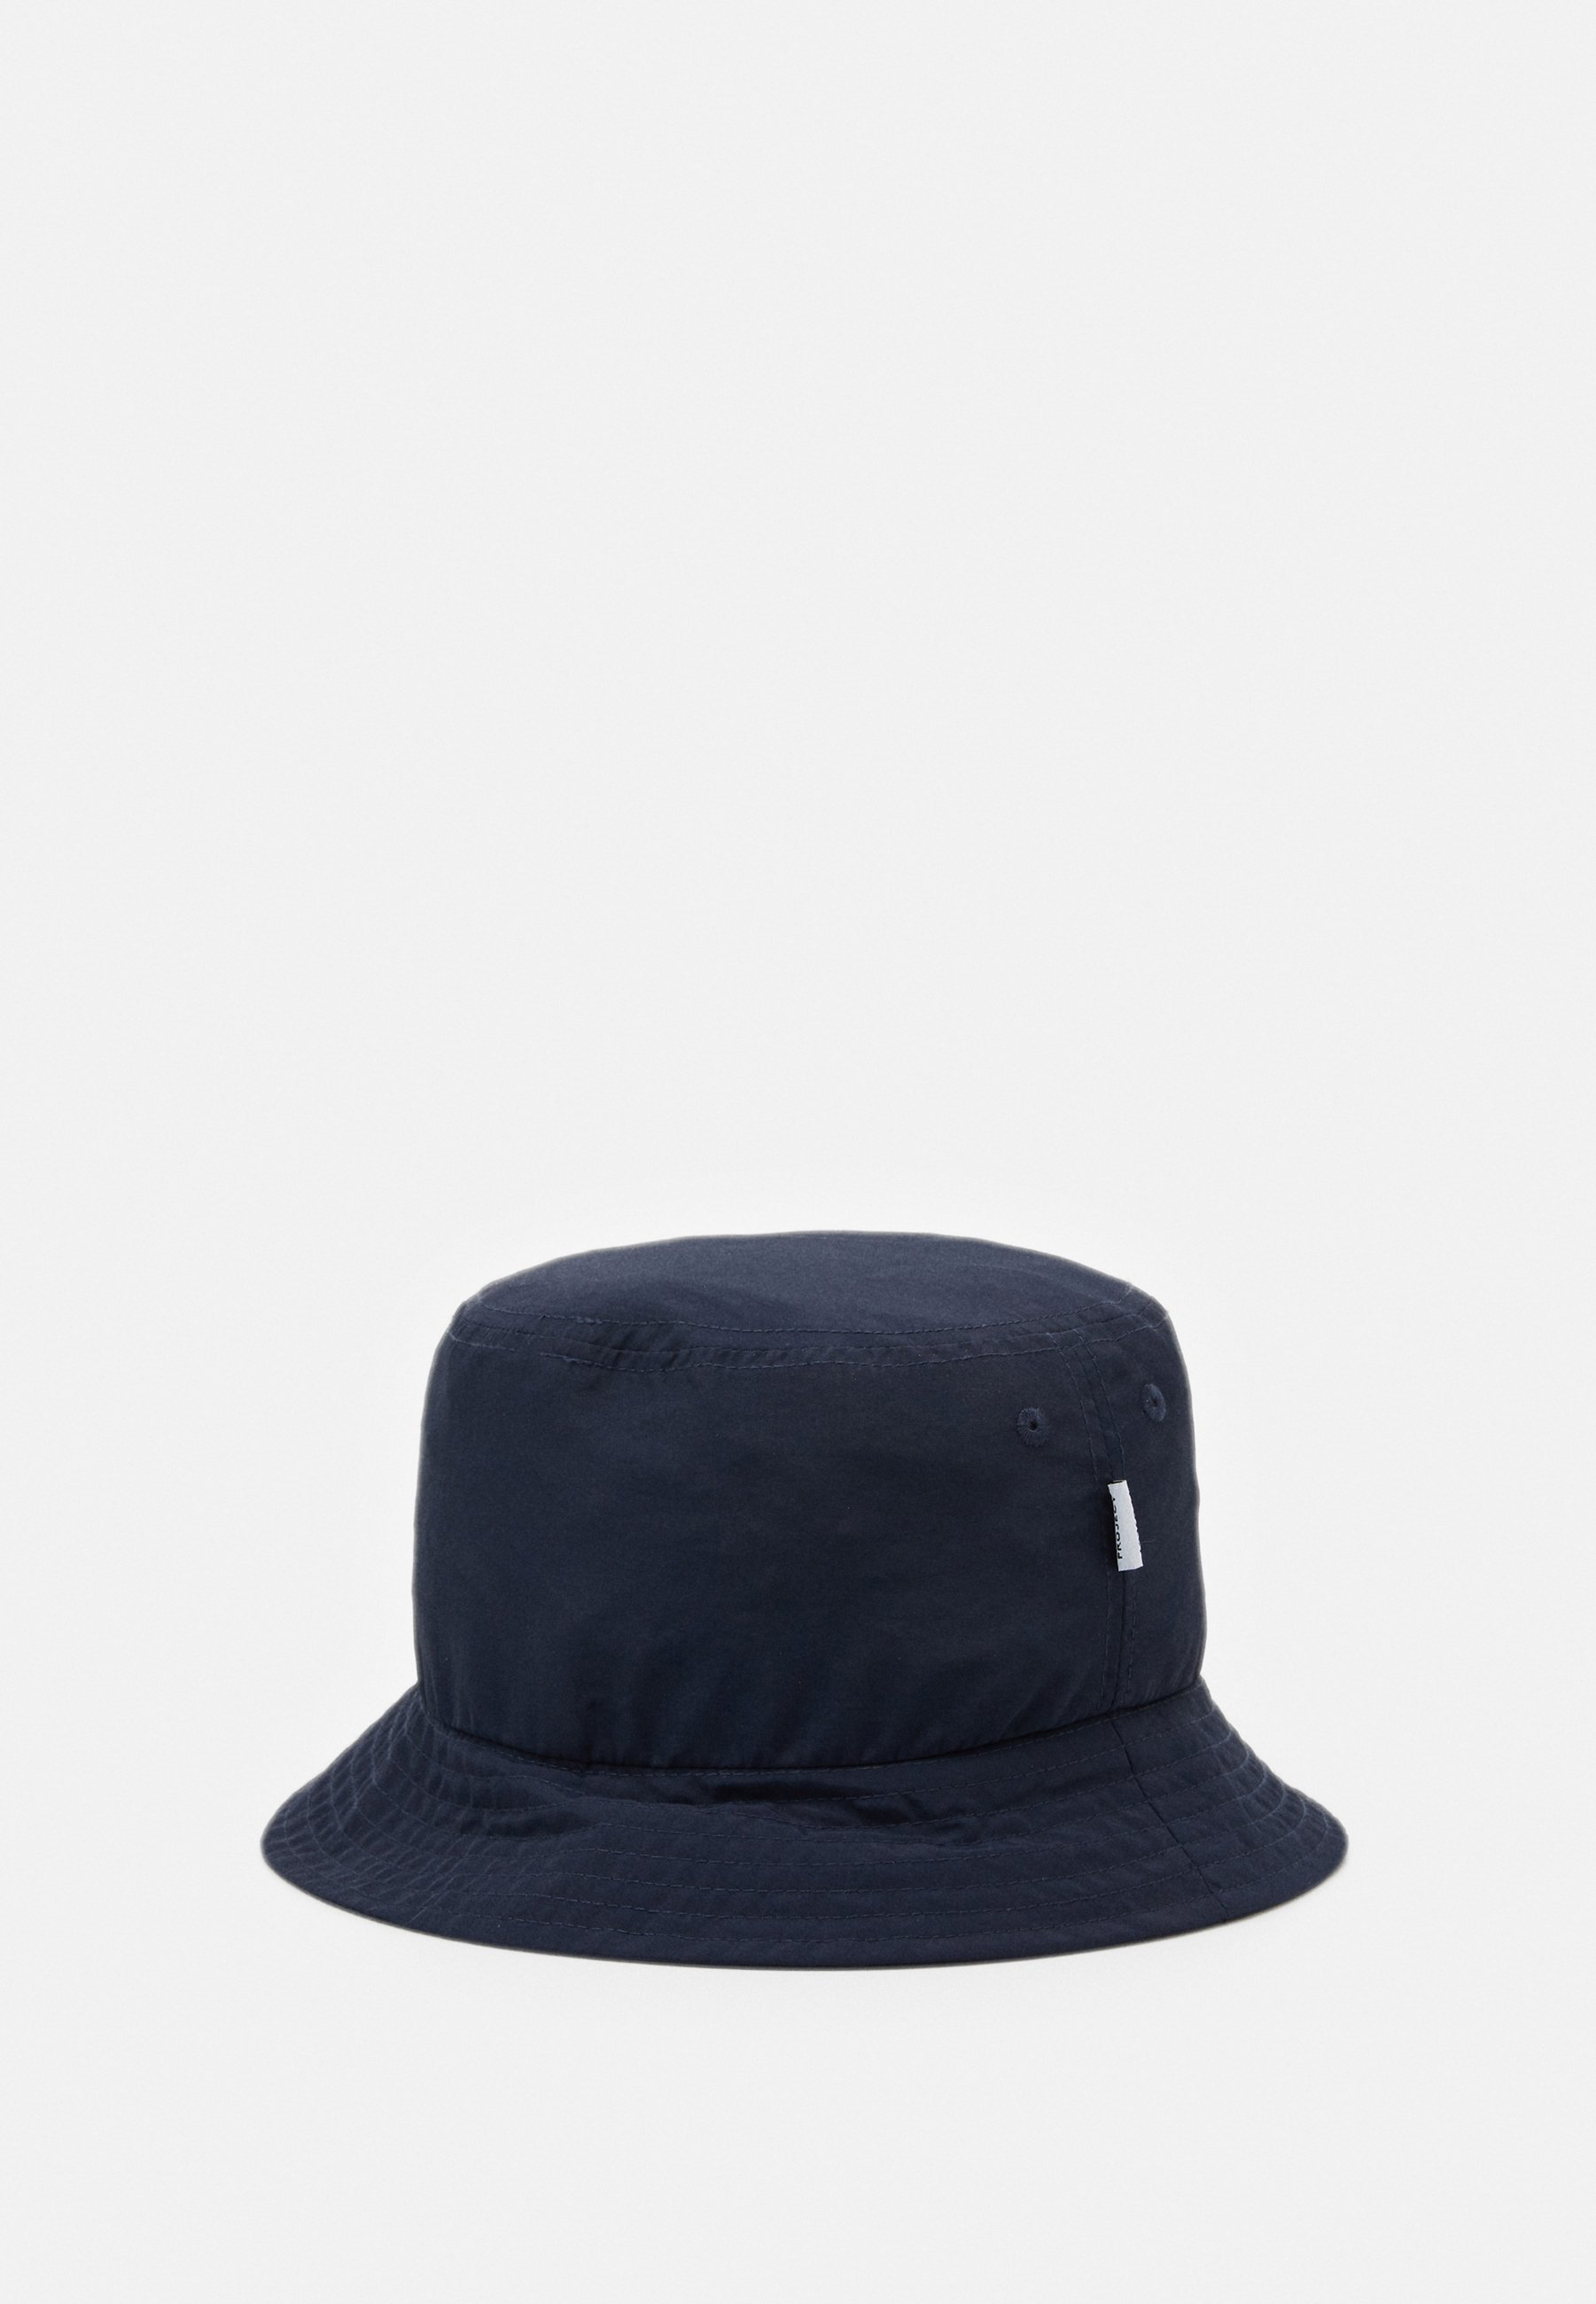 Buy Outlet GARMENT PROJECT BUCKET HAT - Hat - navy | men's accessories 2020 IDVMz